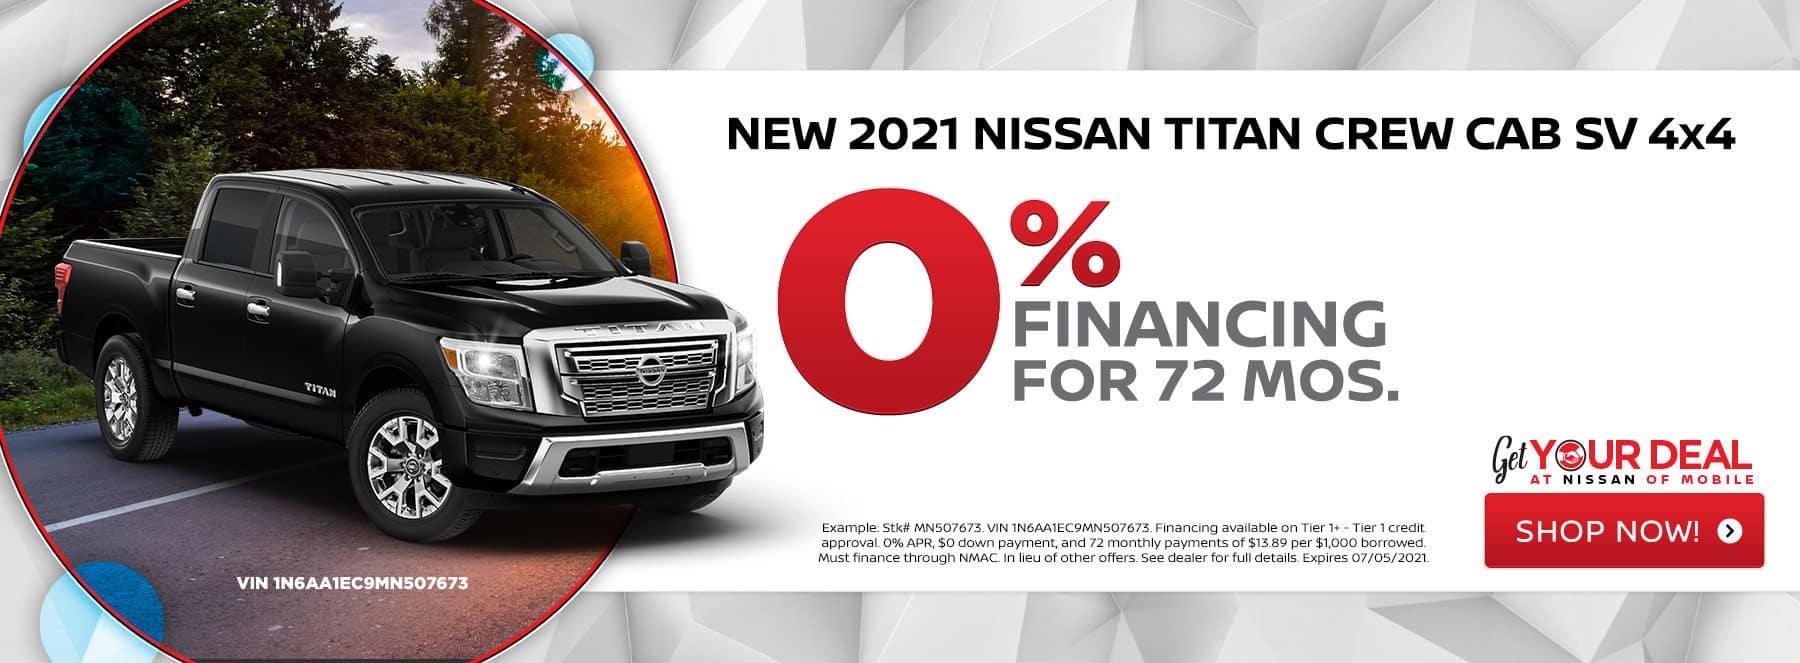 NissanMobile_1800x663_TitanSV_06-21